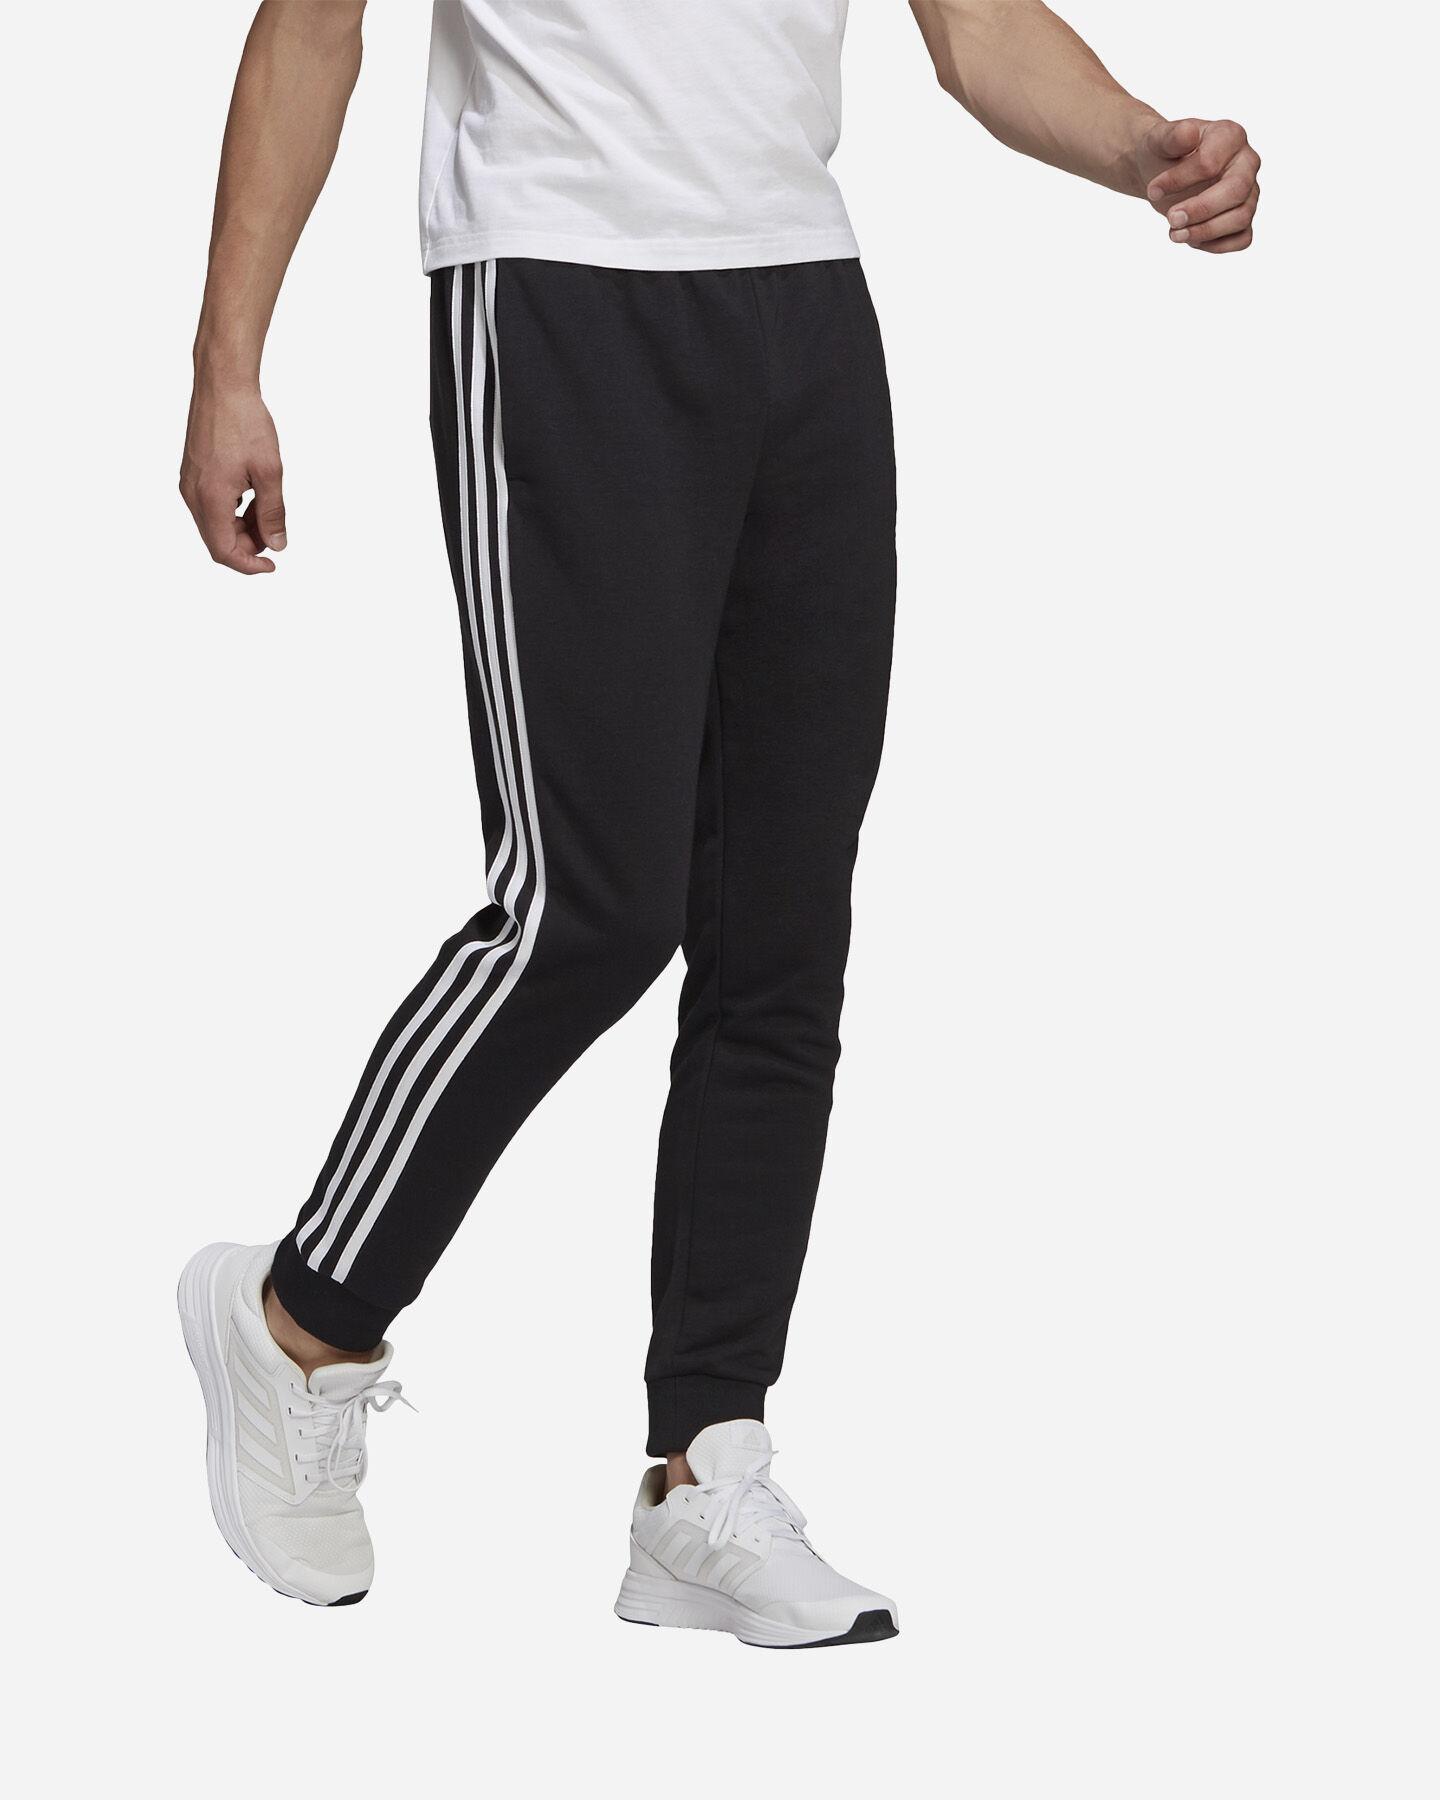 Pantalone ADIDAS FRT CORE 3S M S5274264 scatto 3